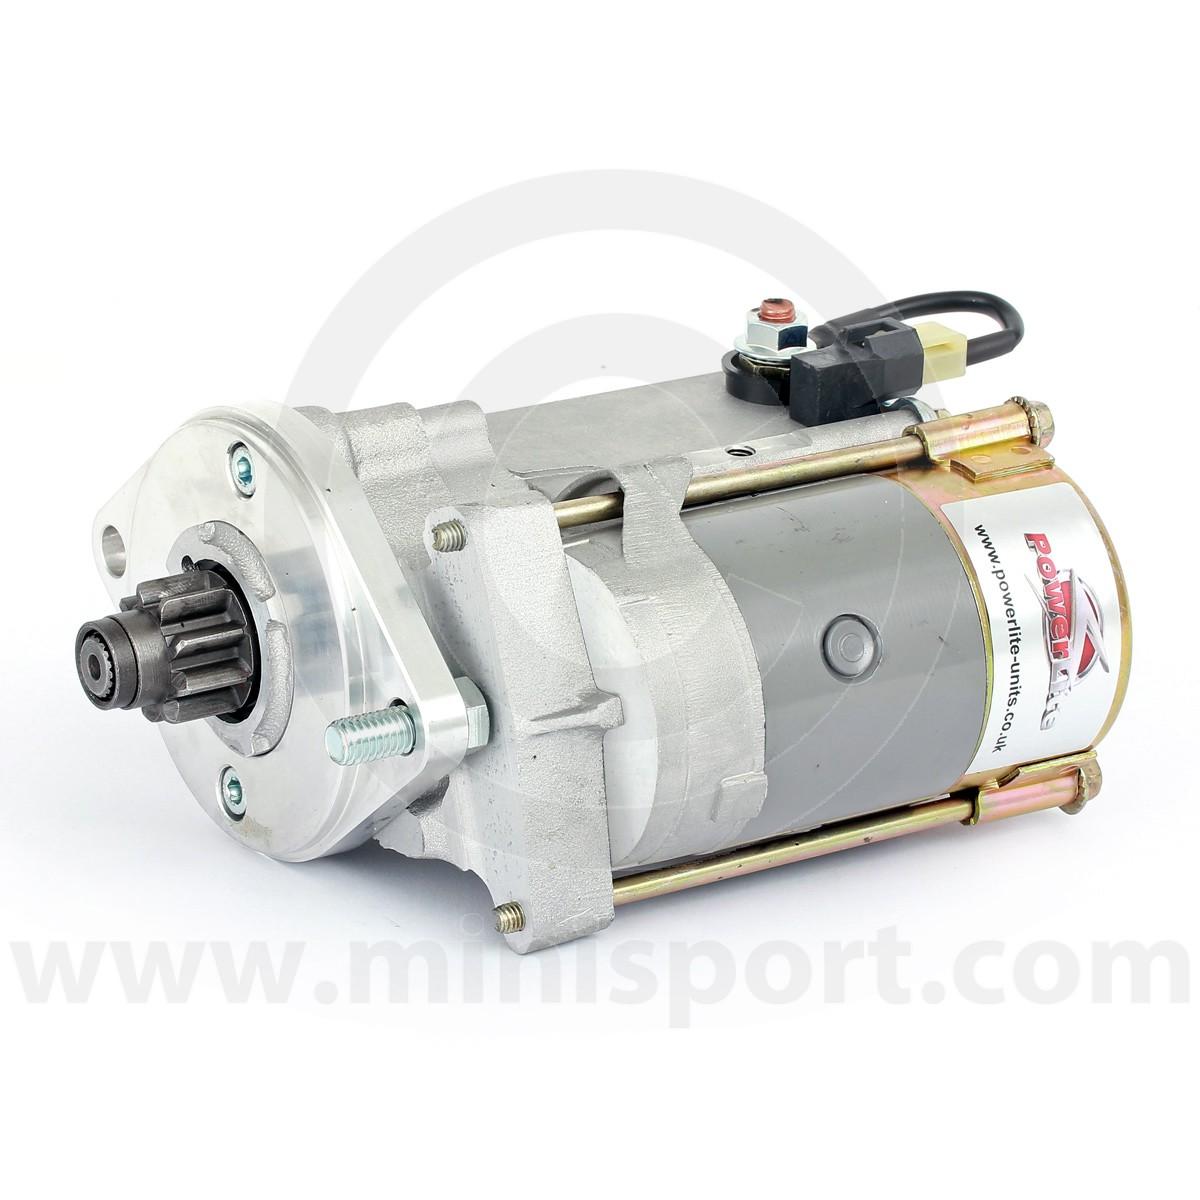 Rac463 Mini Starter Motor Ignition Sport Hi Torque Wiring Diagram More Views